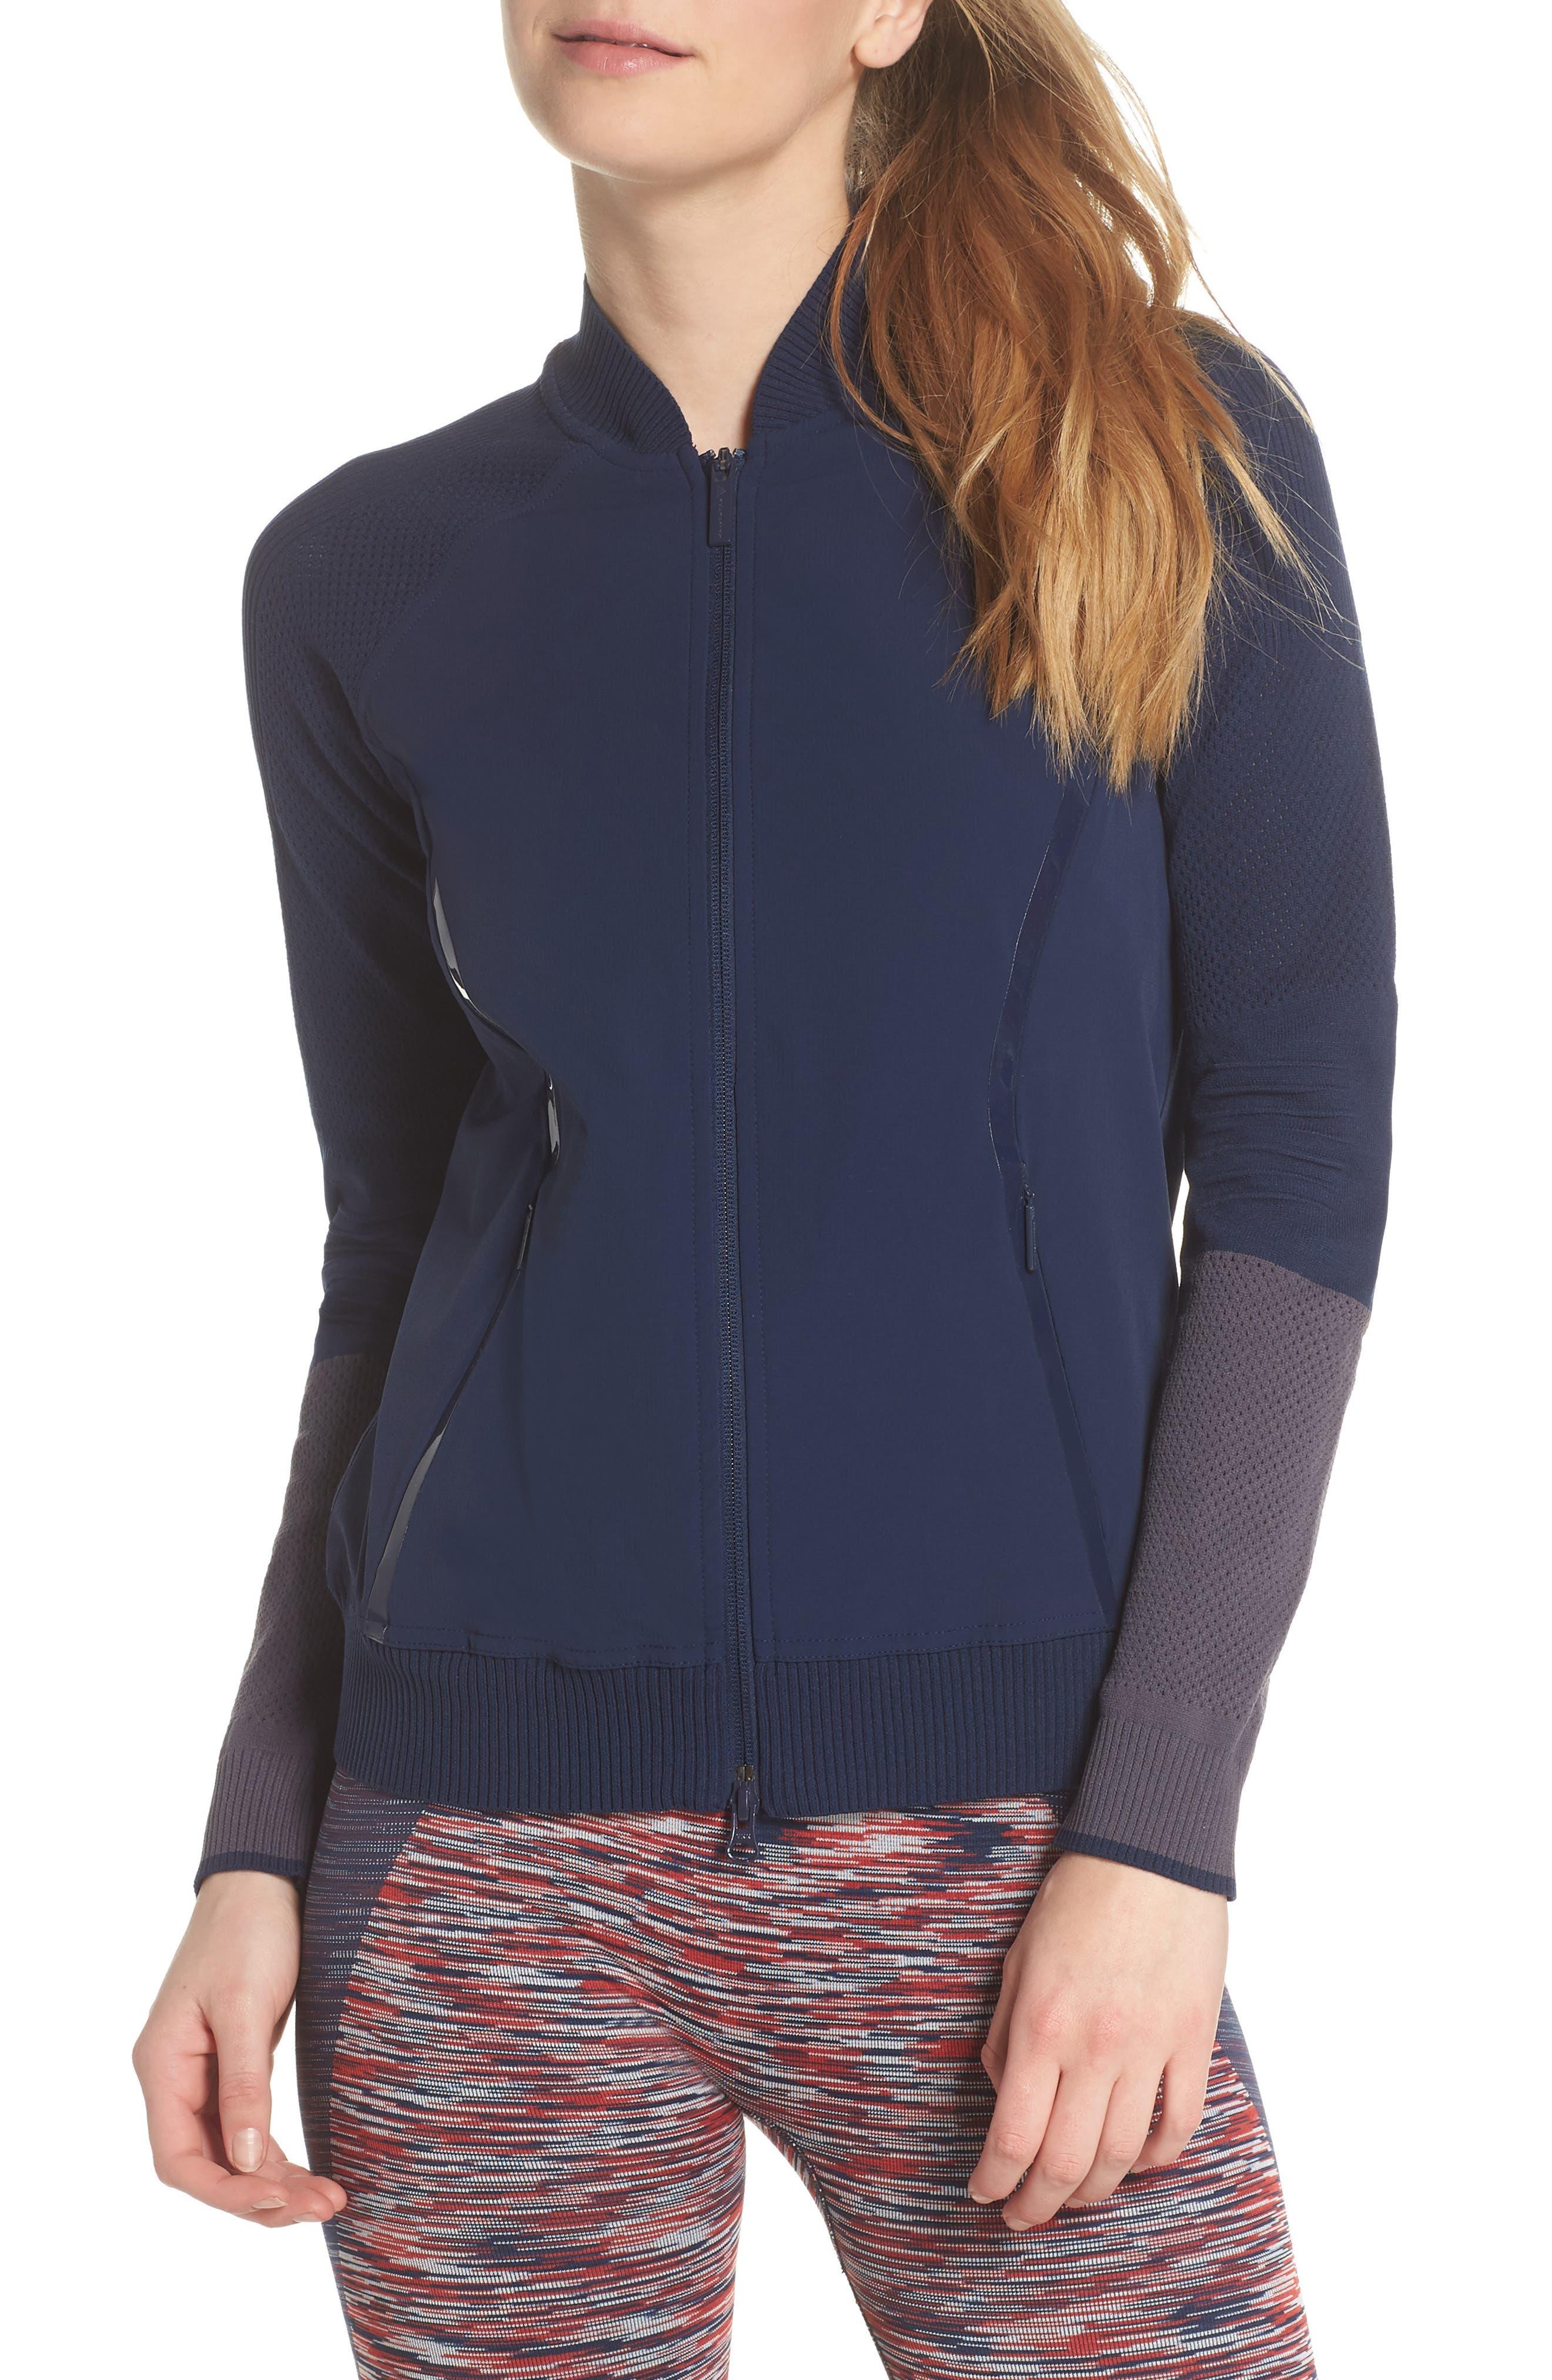 Run Ultra Knit & Woven Jacket,                             Main thumbnail 1, color,                             Collegiate Navy